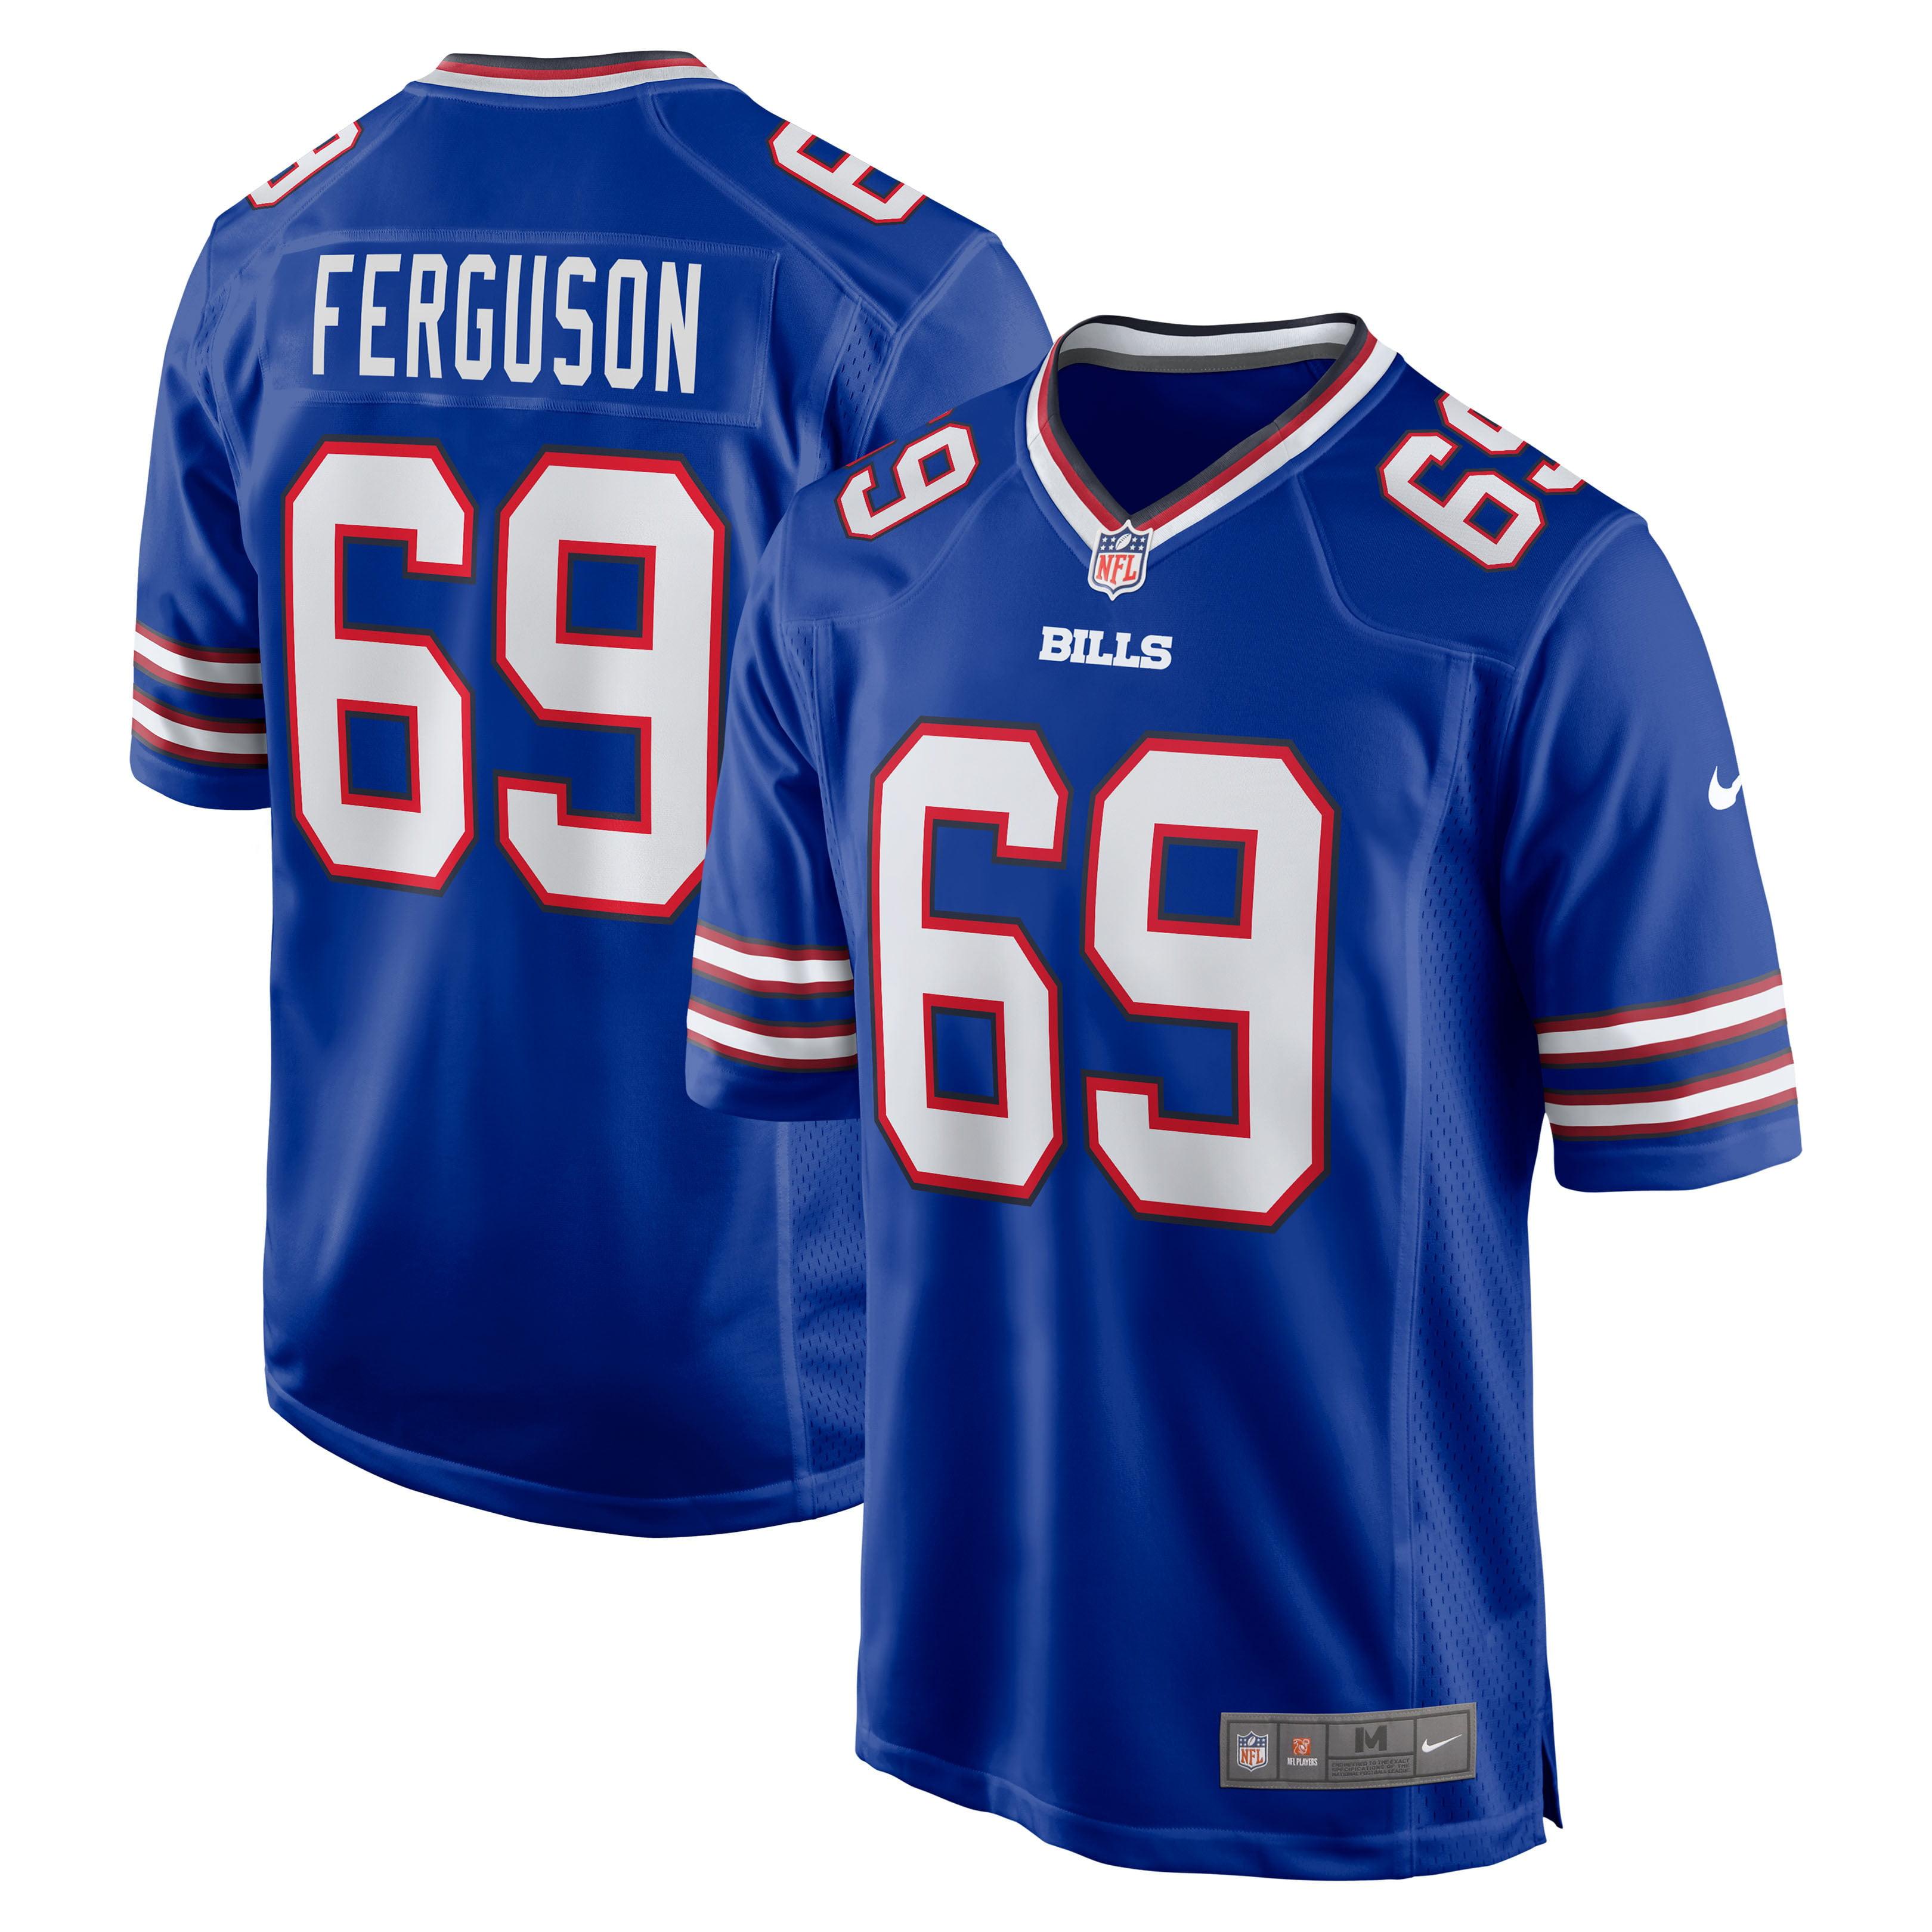 Reid Ferguson Buffalo Bills Nike Game Jersey - Royal - Walmart.com